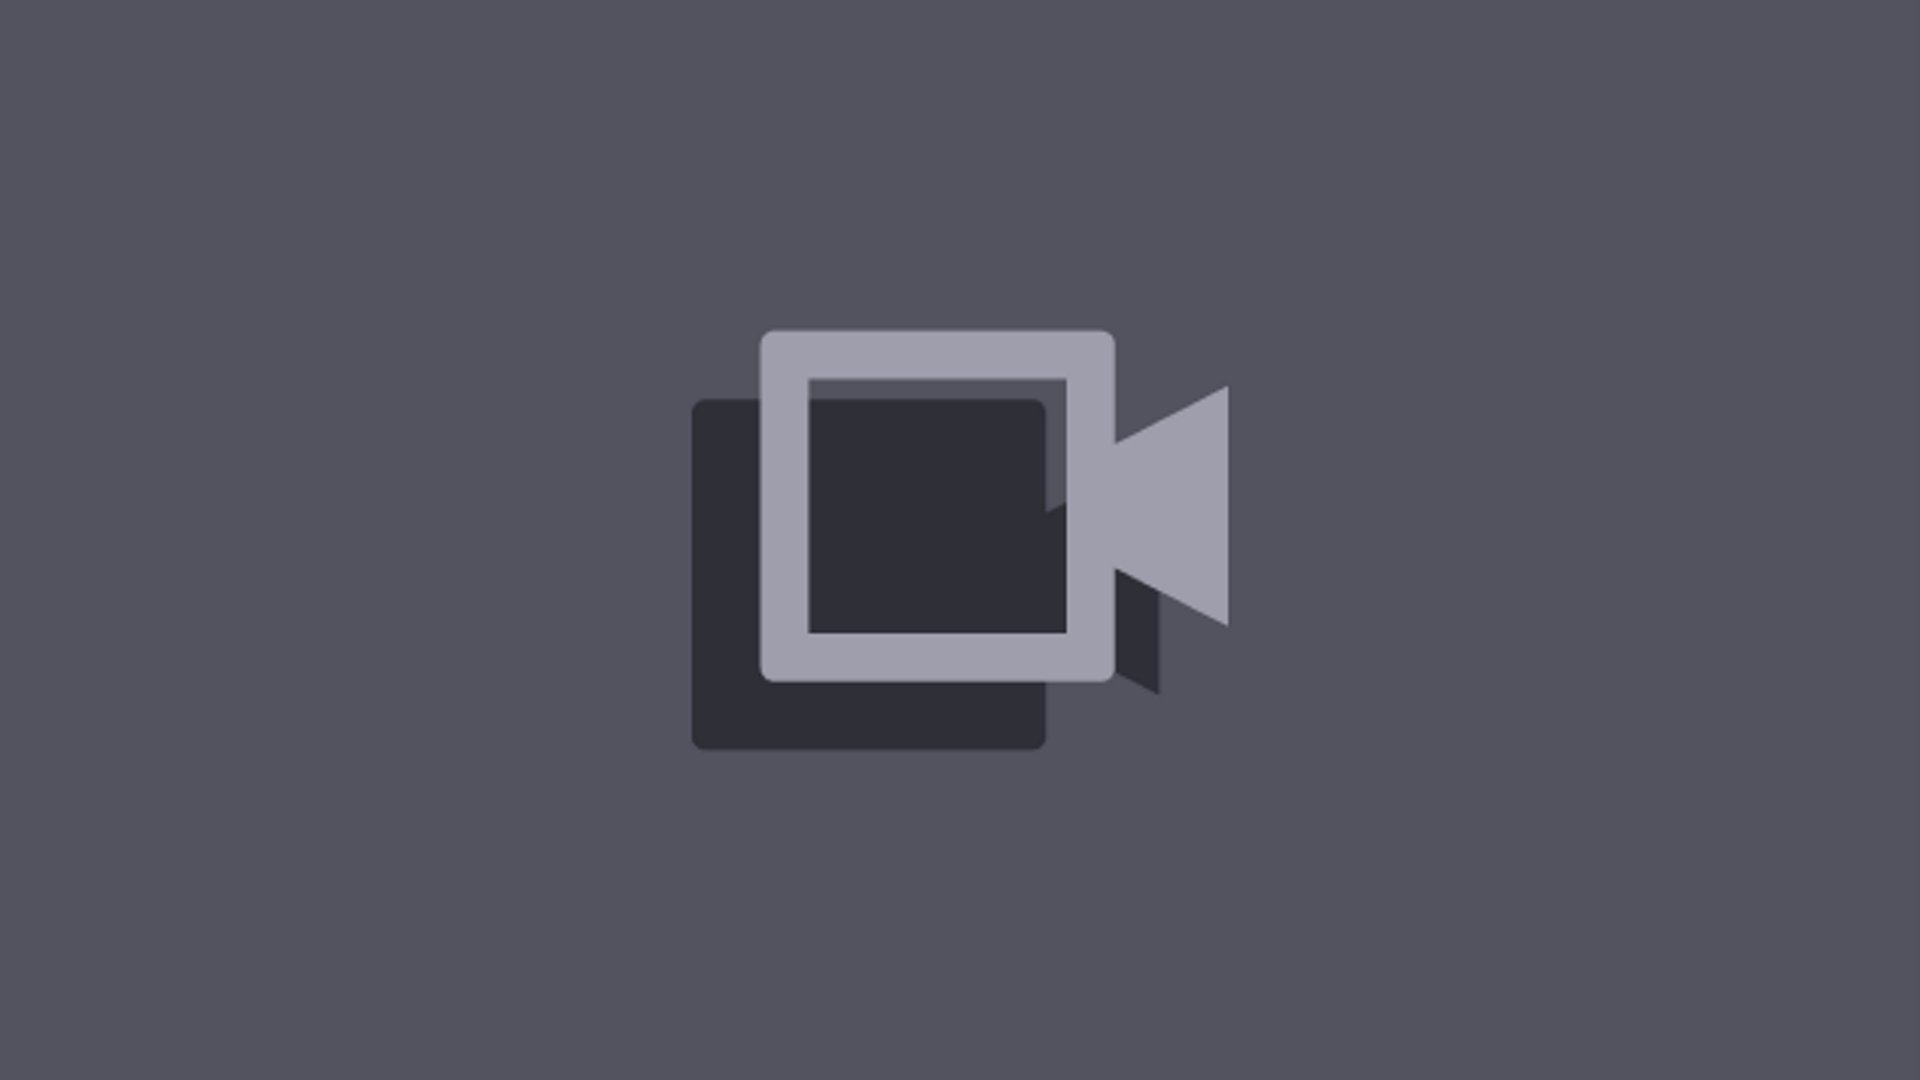 aziegodx - Live】PikoLive - Twitch, Game, Entertainment